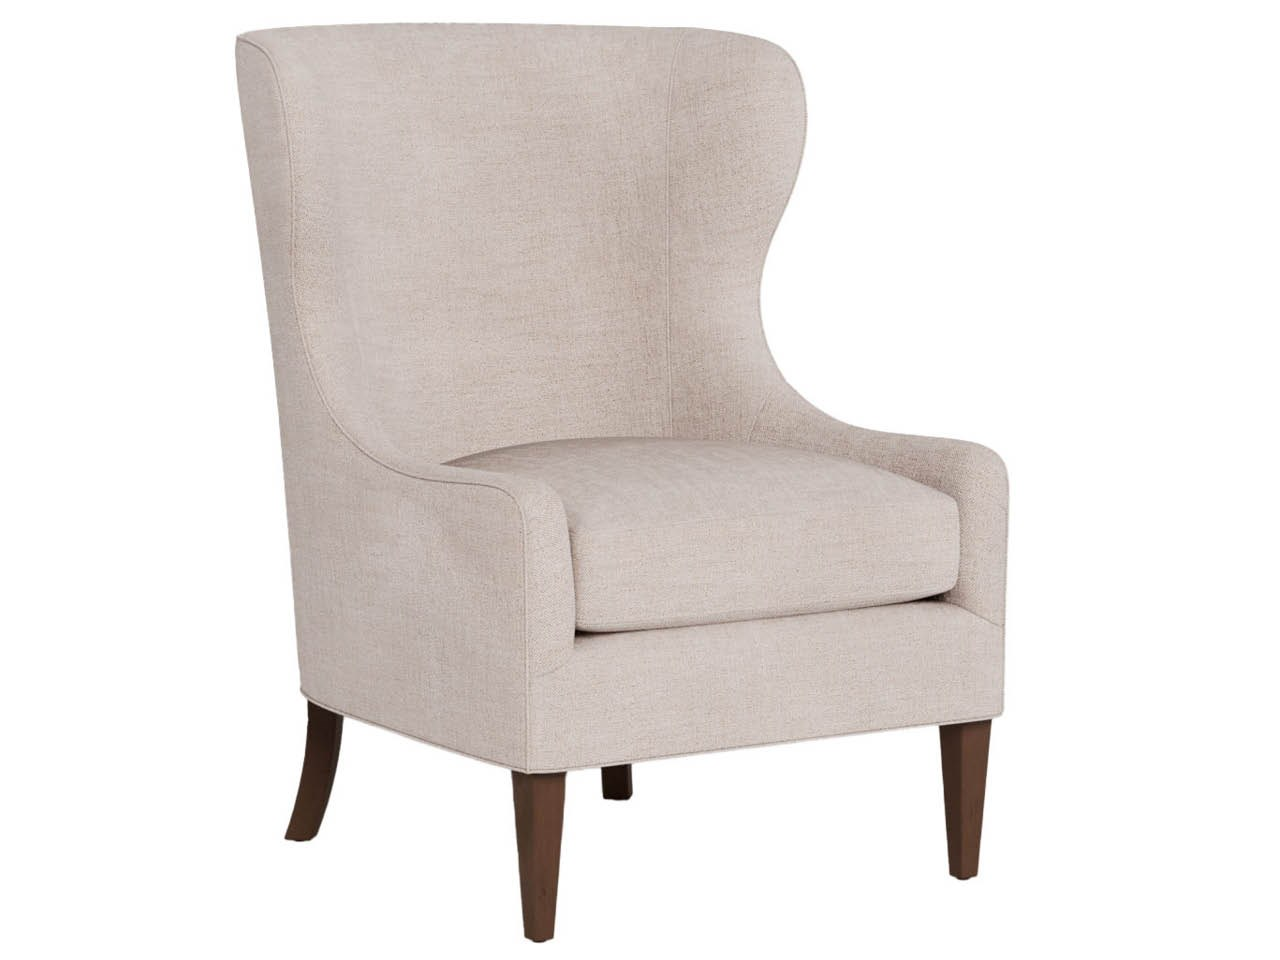 Austin Chair - Special Order